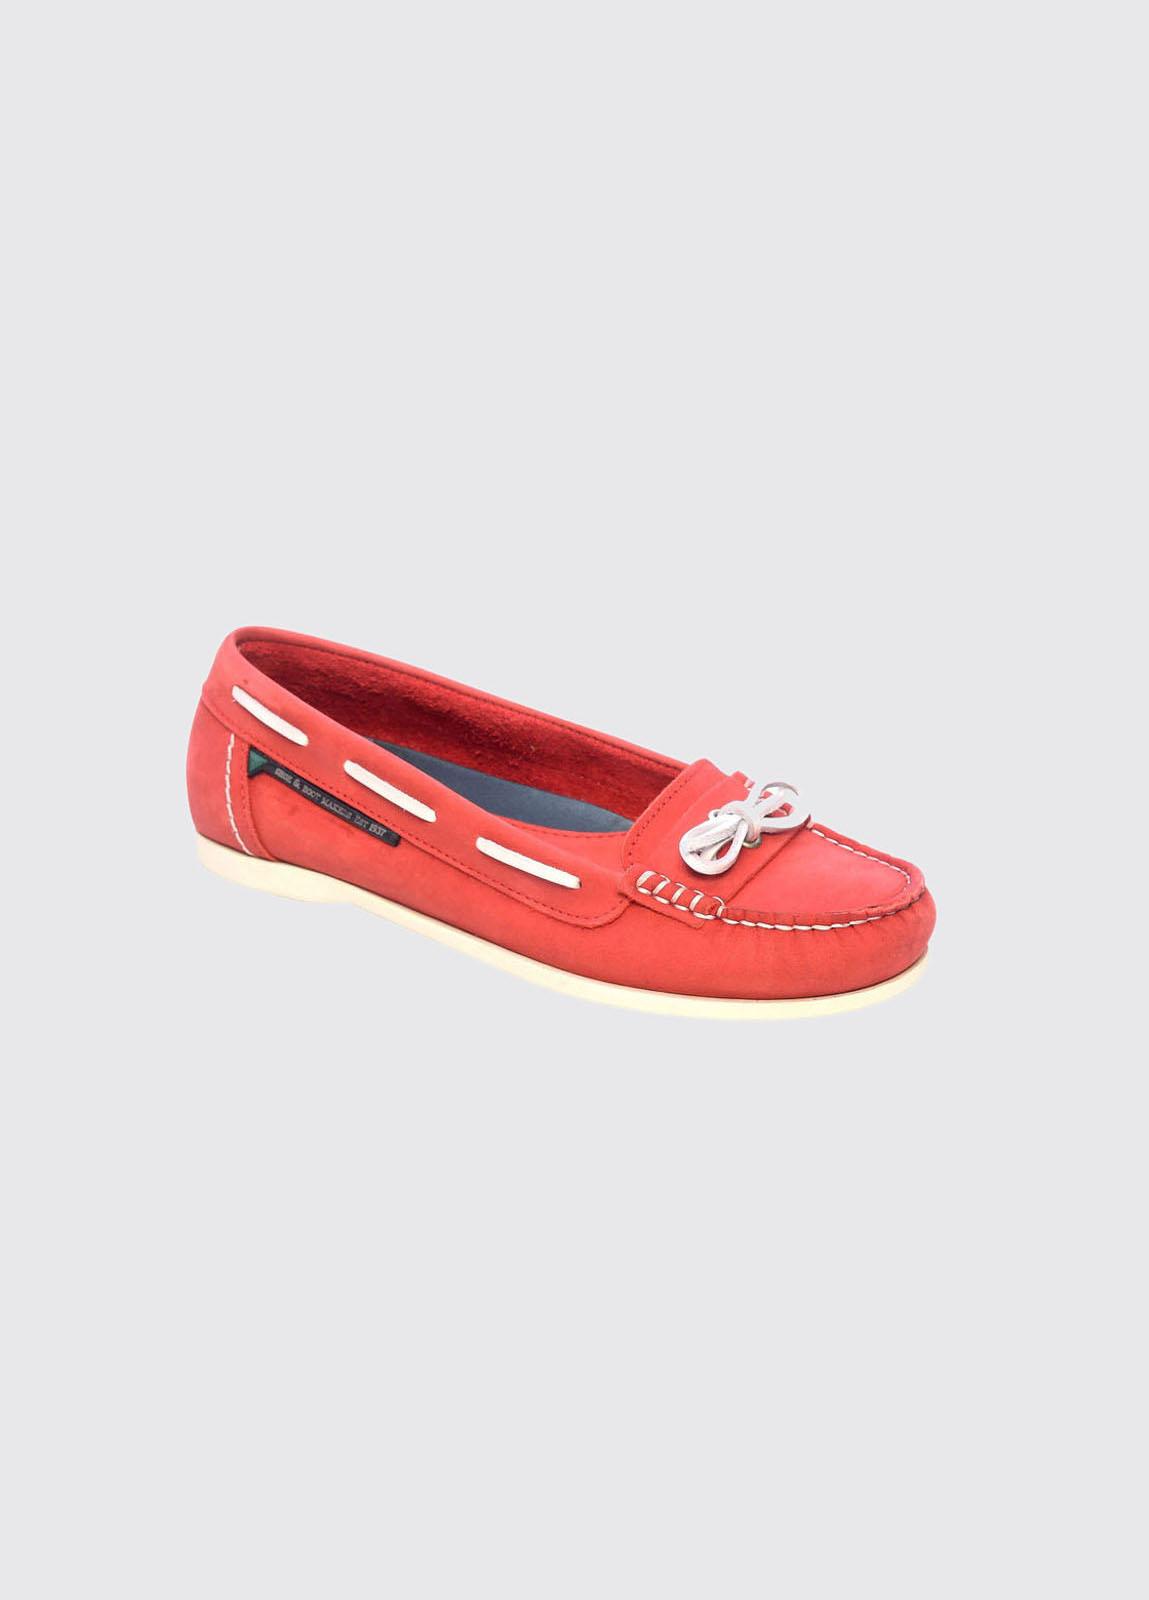 Fiji Women's Moccasins - Red